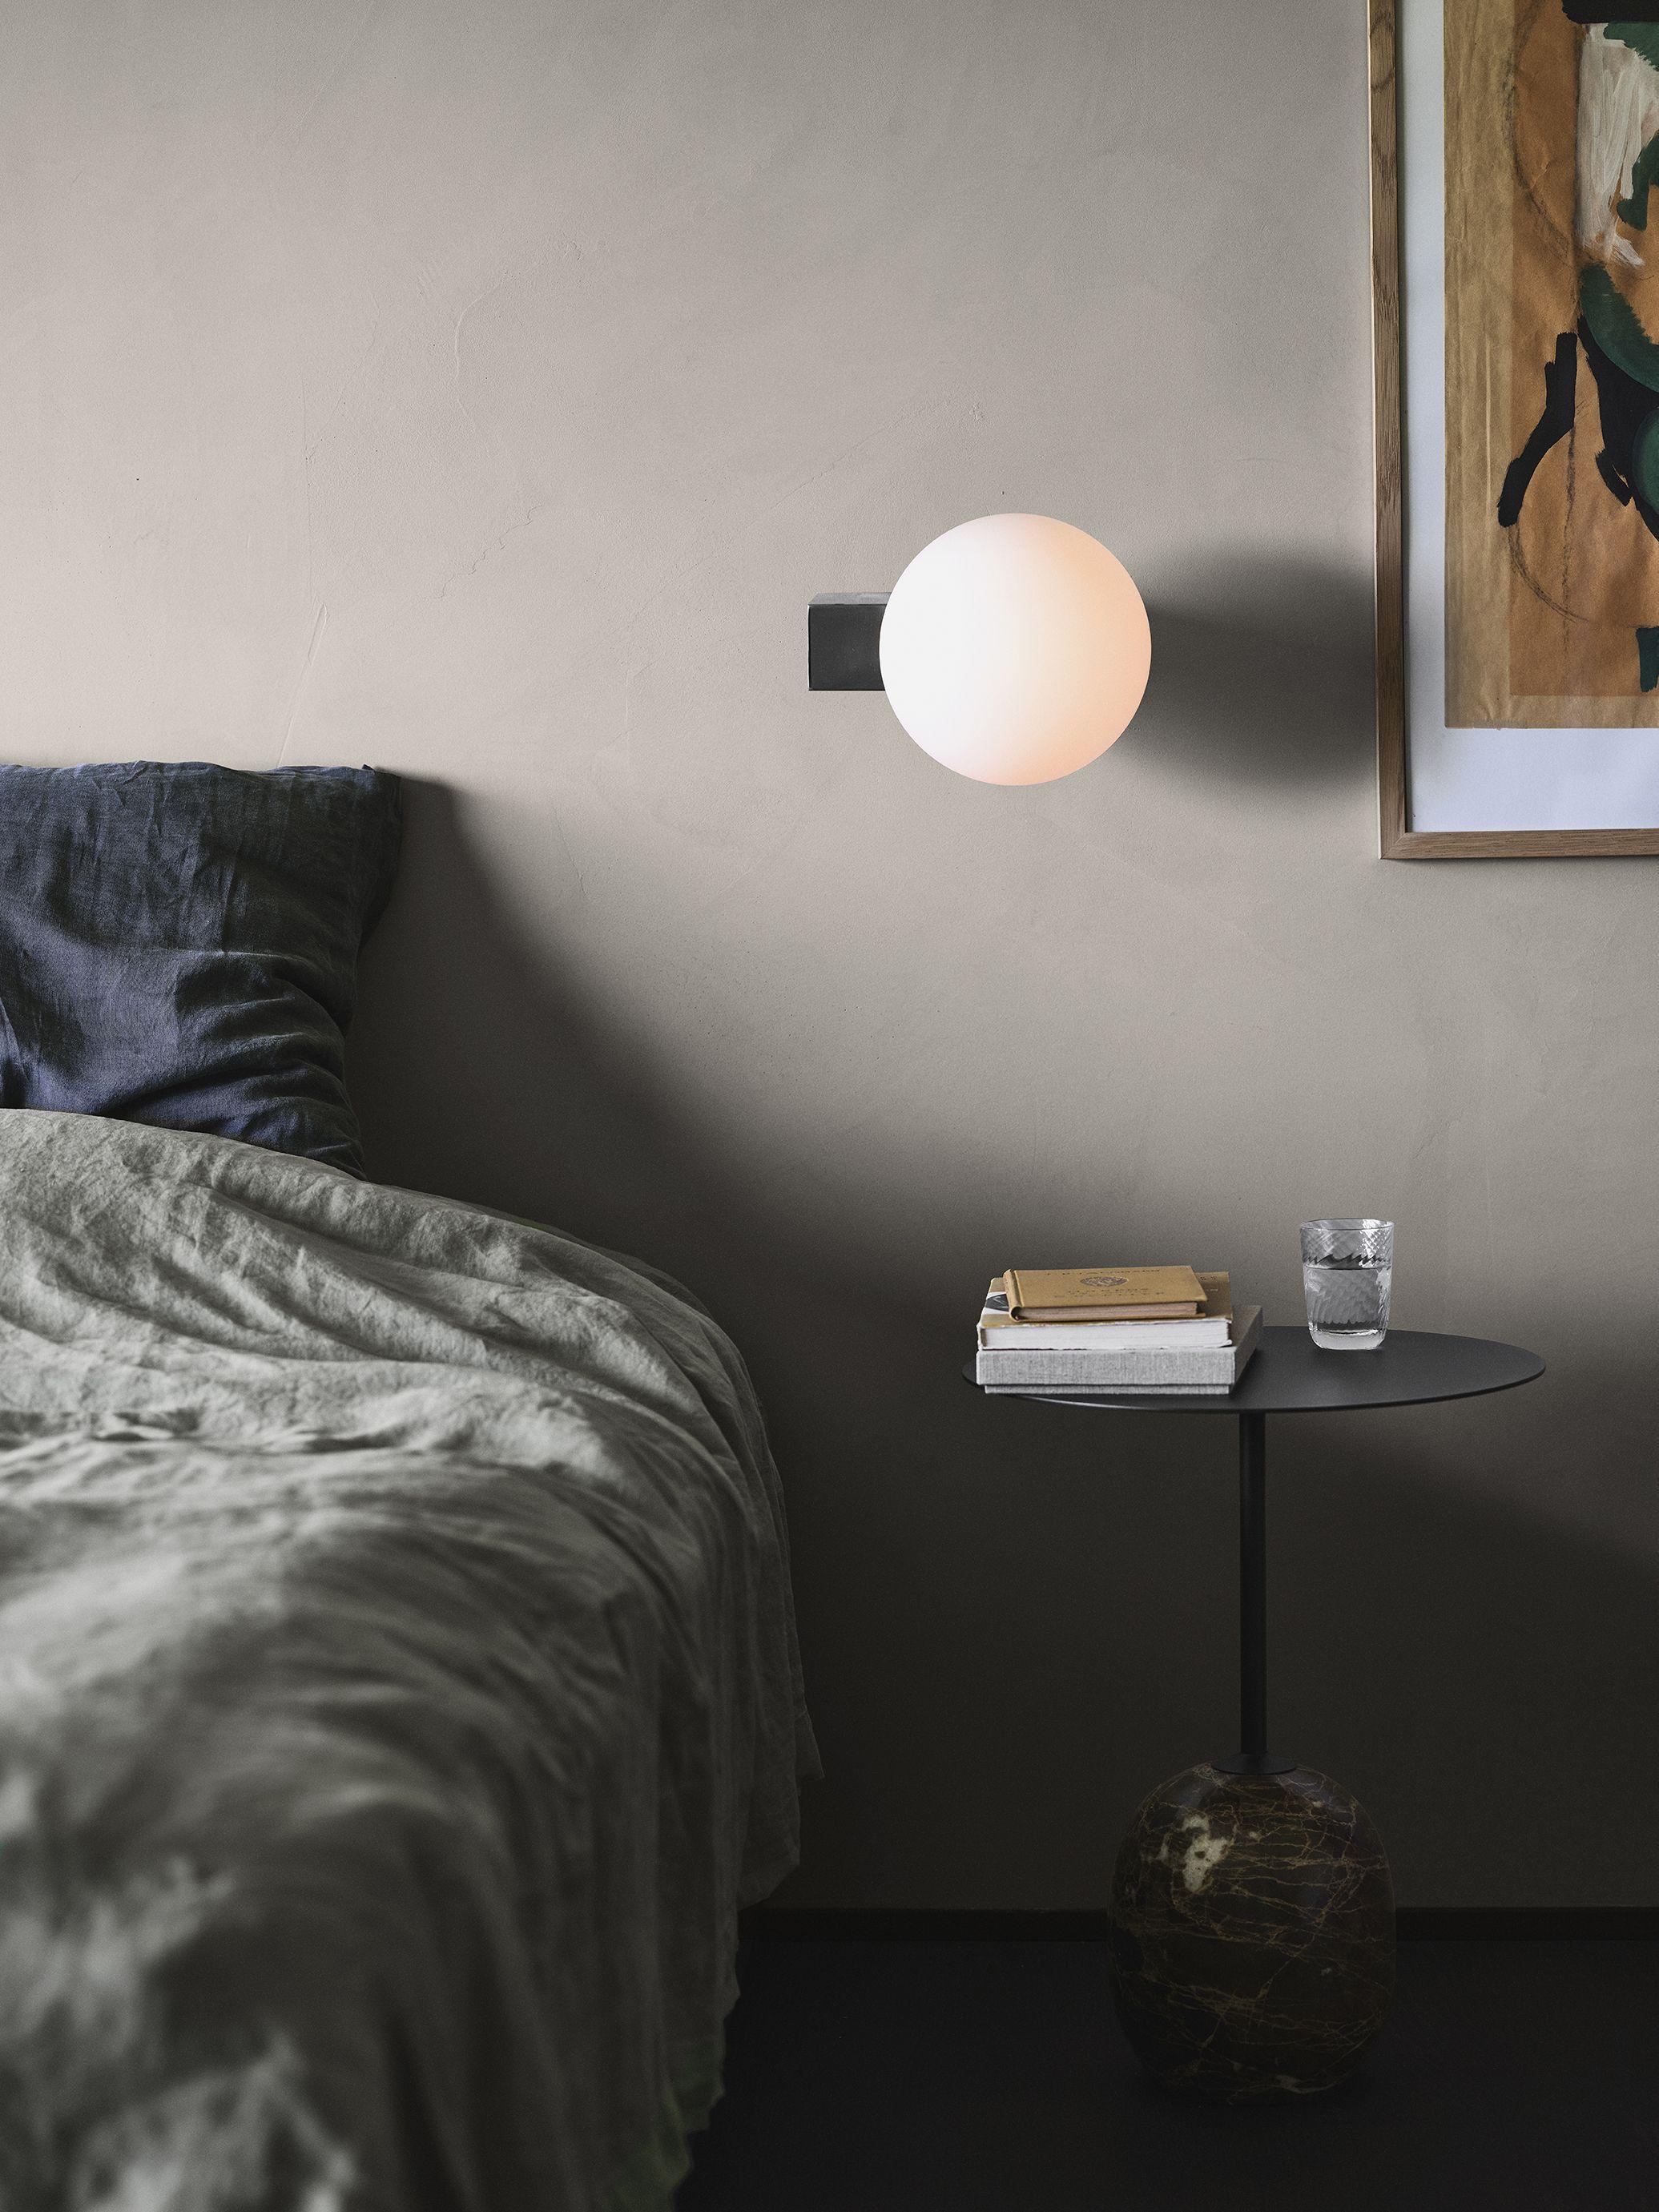 Journey Lamp And Lato Side Table Wall Lamp Wall Lights Wall Lighting Design